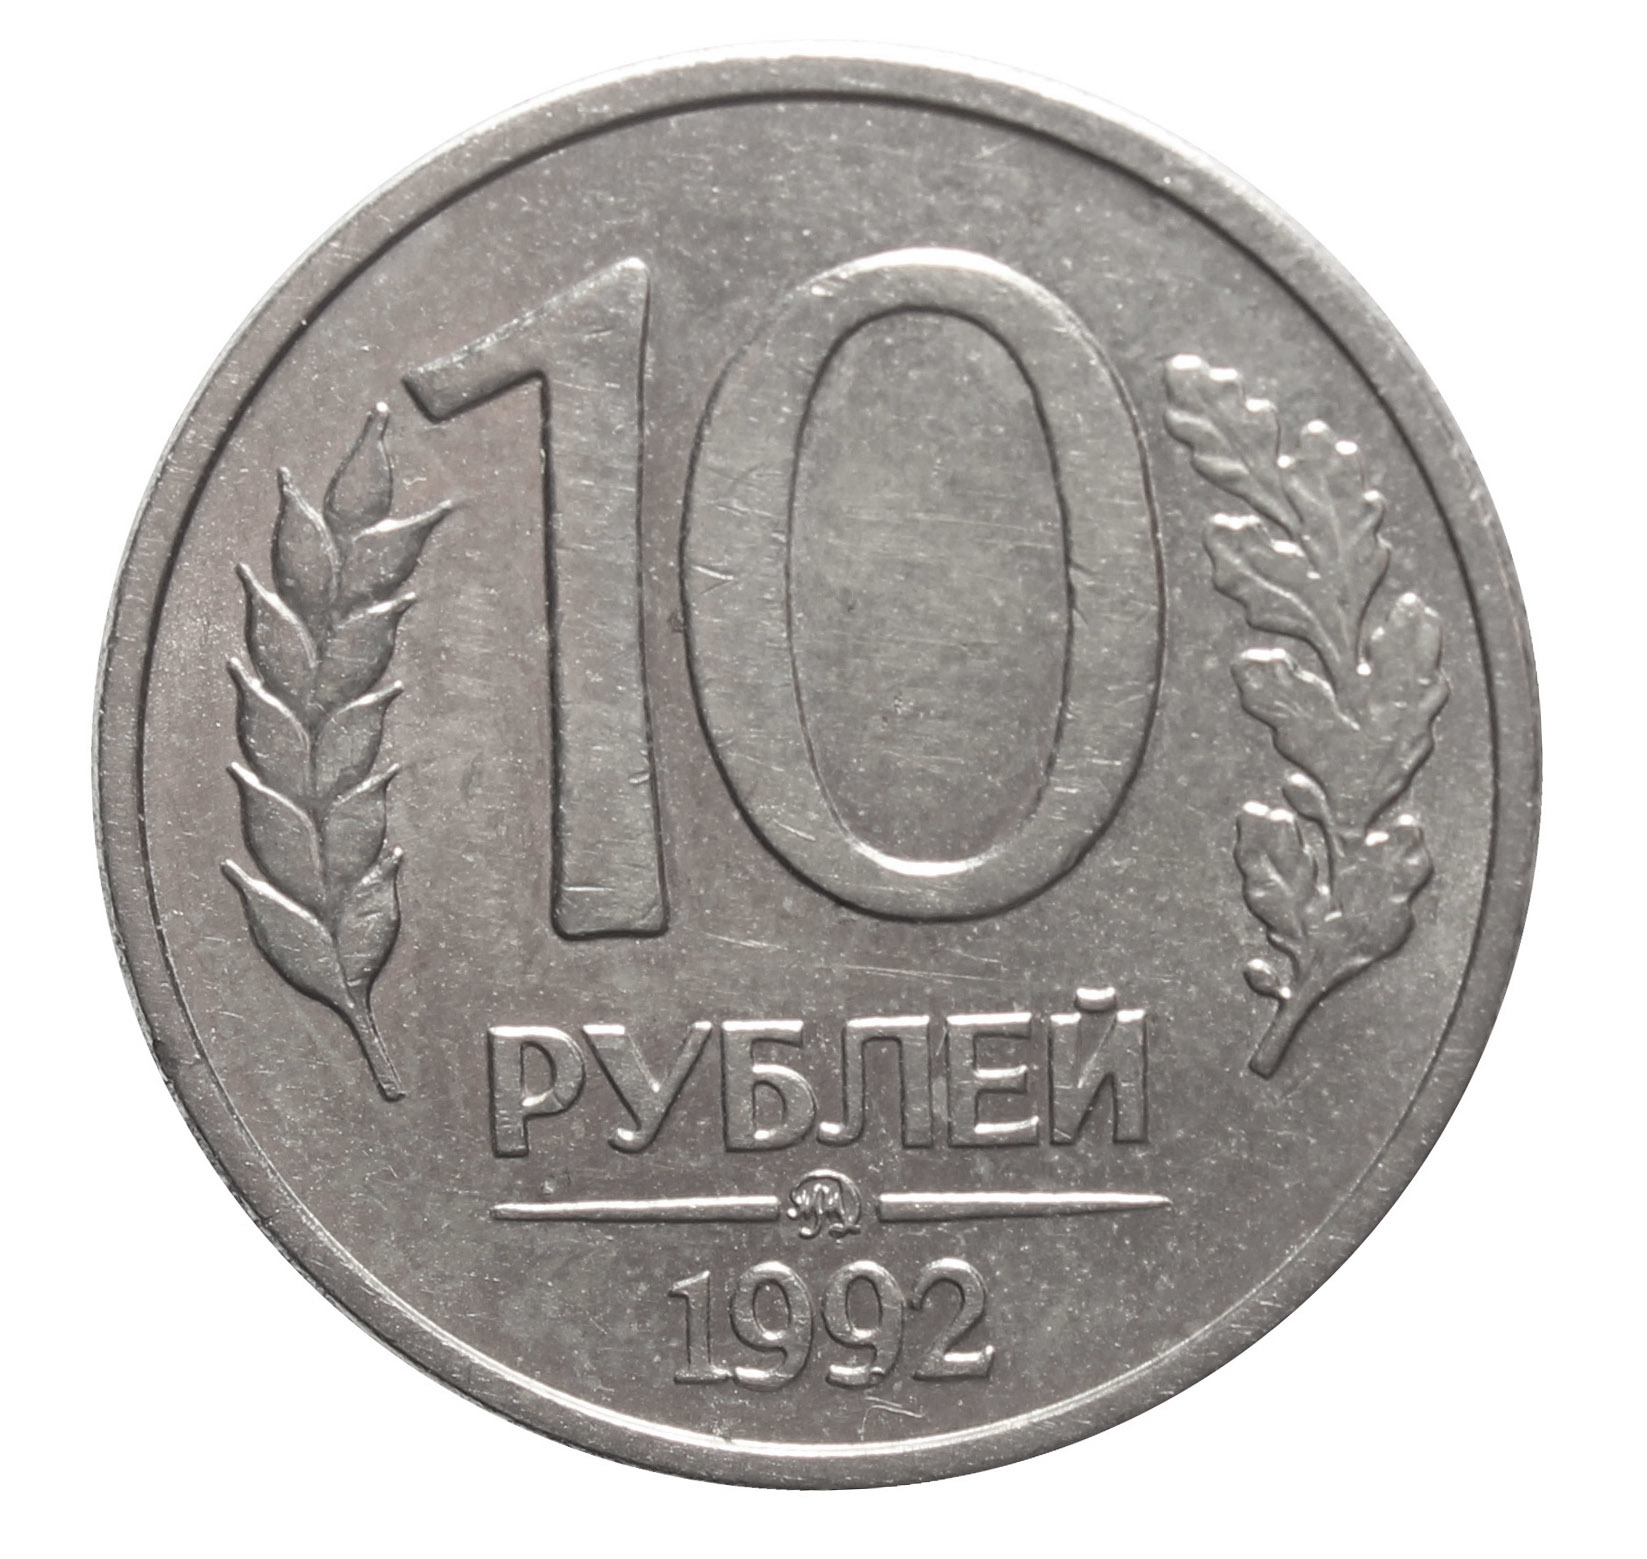 10 рублей. ММД. Магнитная. 1992 год. XF-